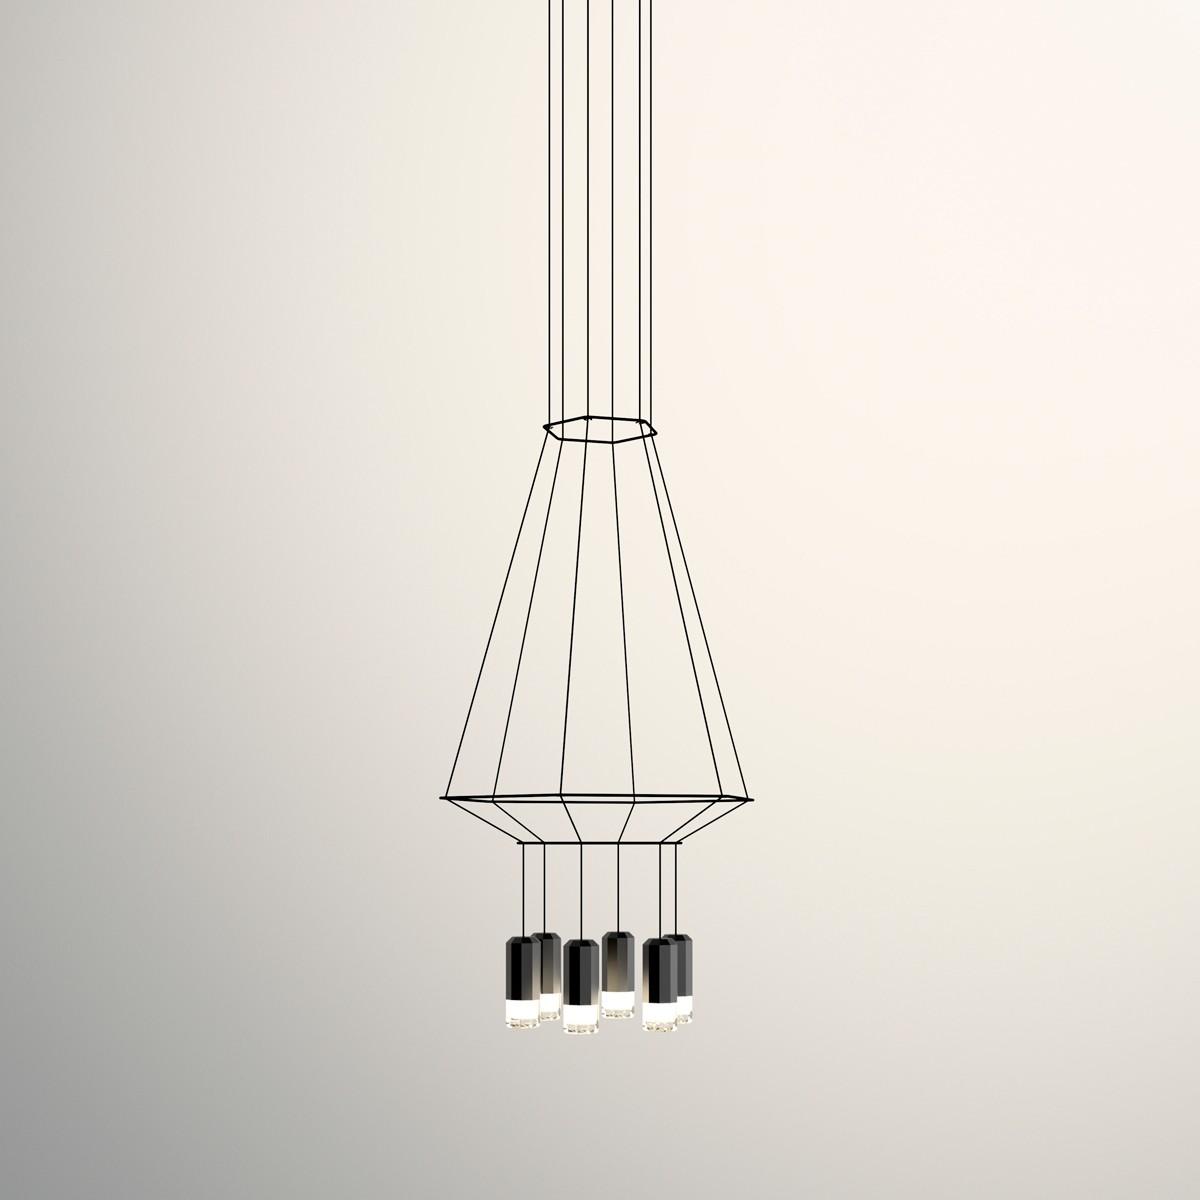 Vibia Wireflow Pendelleuchte, 6-flg., 50 x 57,7 cm, schwarz